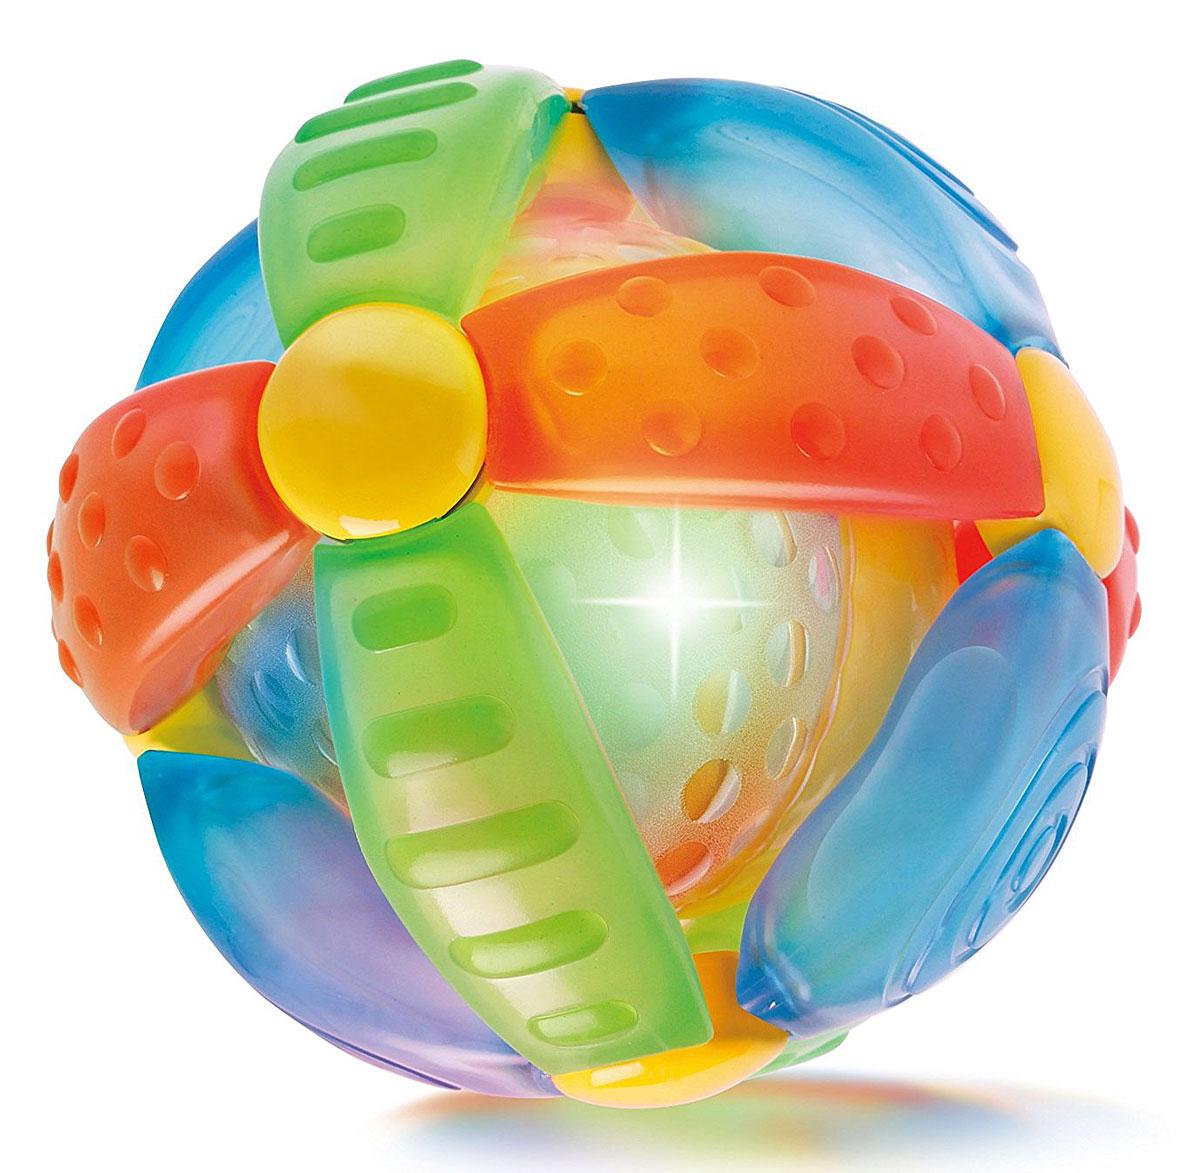 B kids Развивающая игрушка Шар-цветок b kids развивающая игрушка шар конструктор